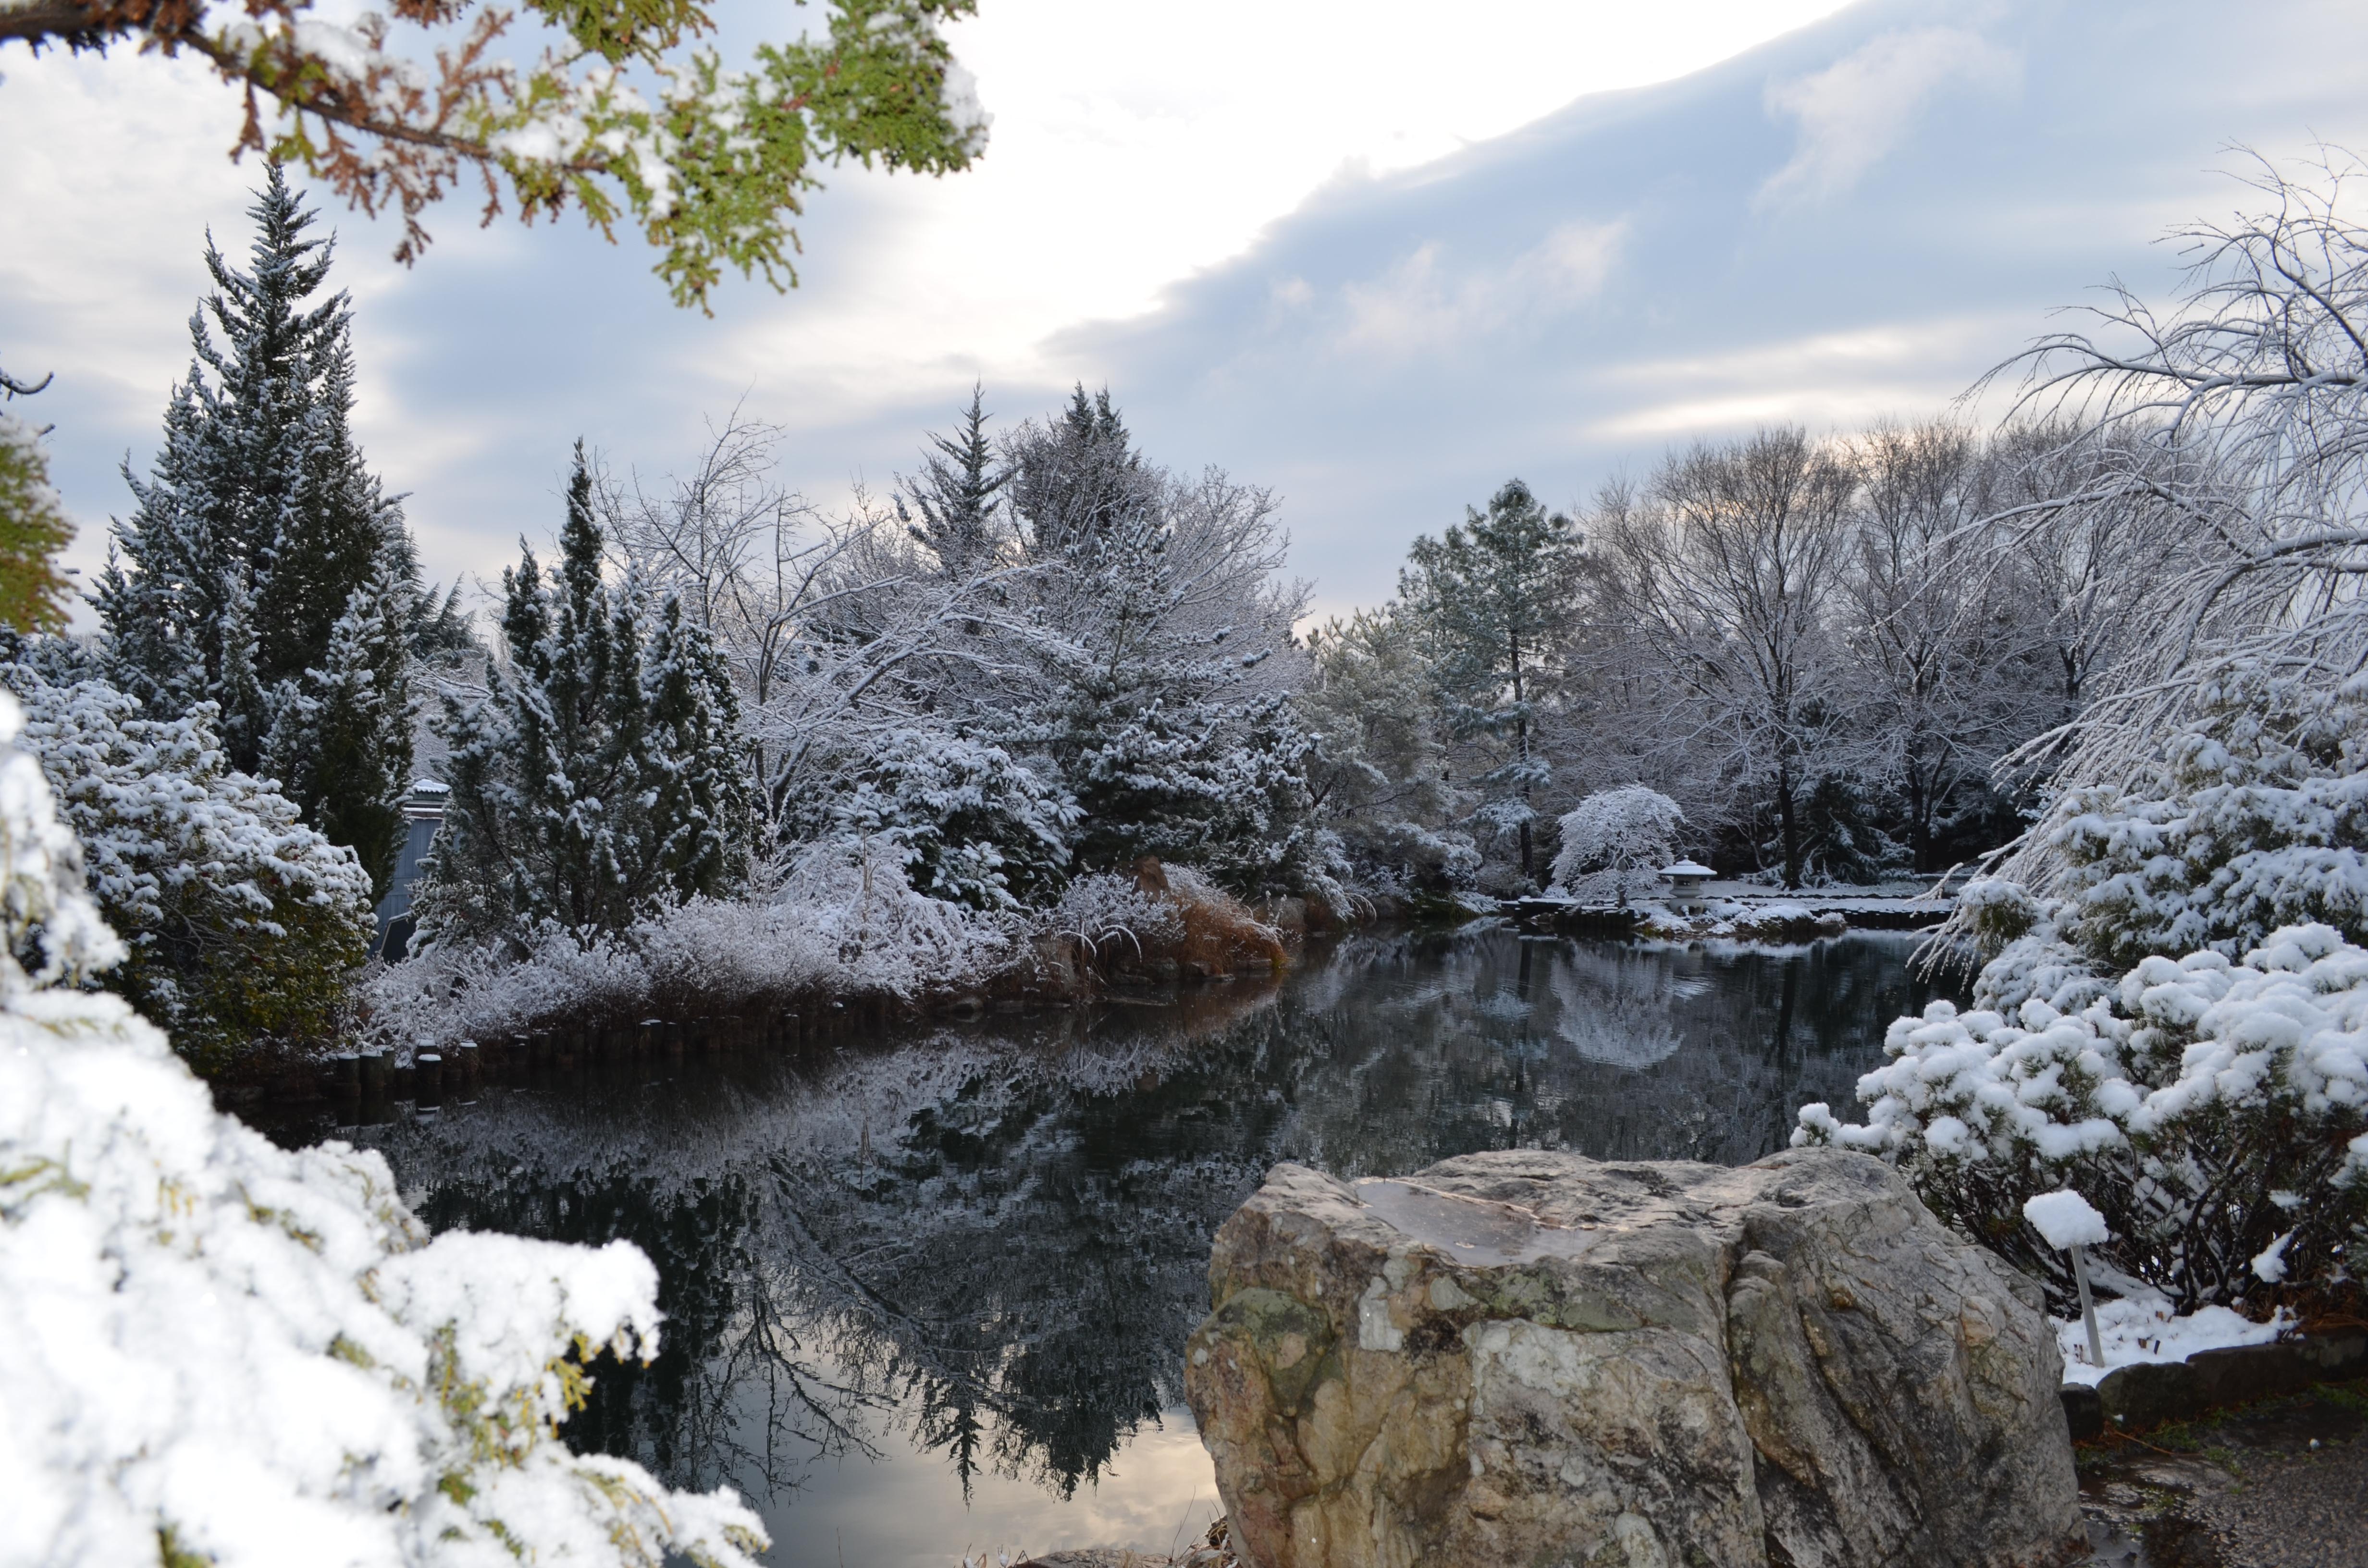 winter wonderland at lewis ginter botanical garden